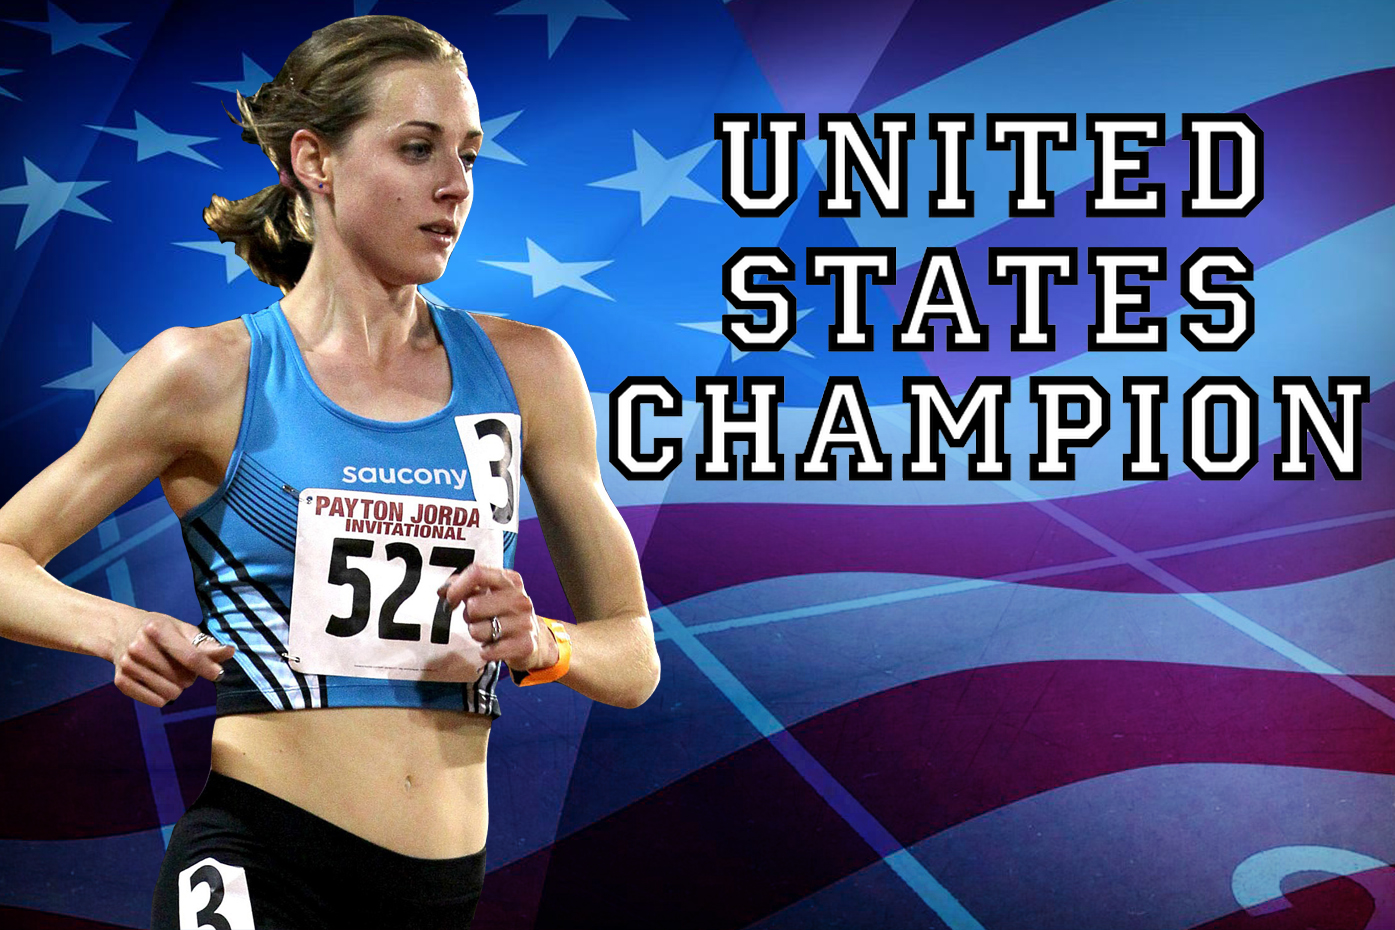 Molly Huddle US Champ_1529697205220.jpg.jpg